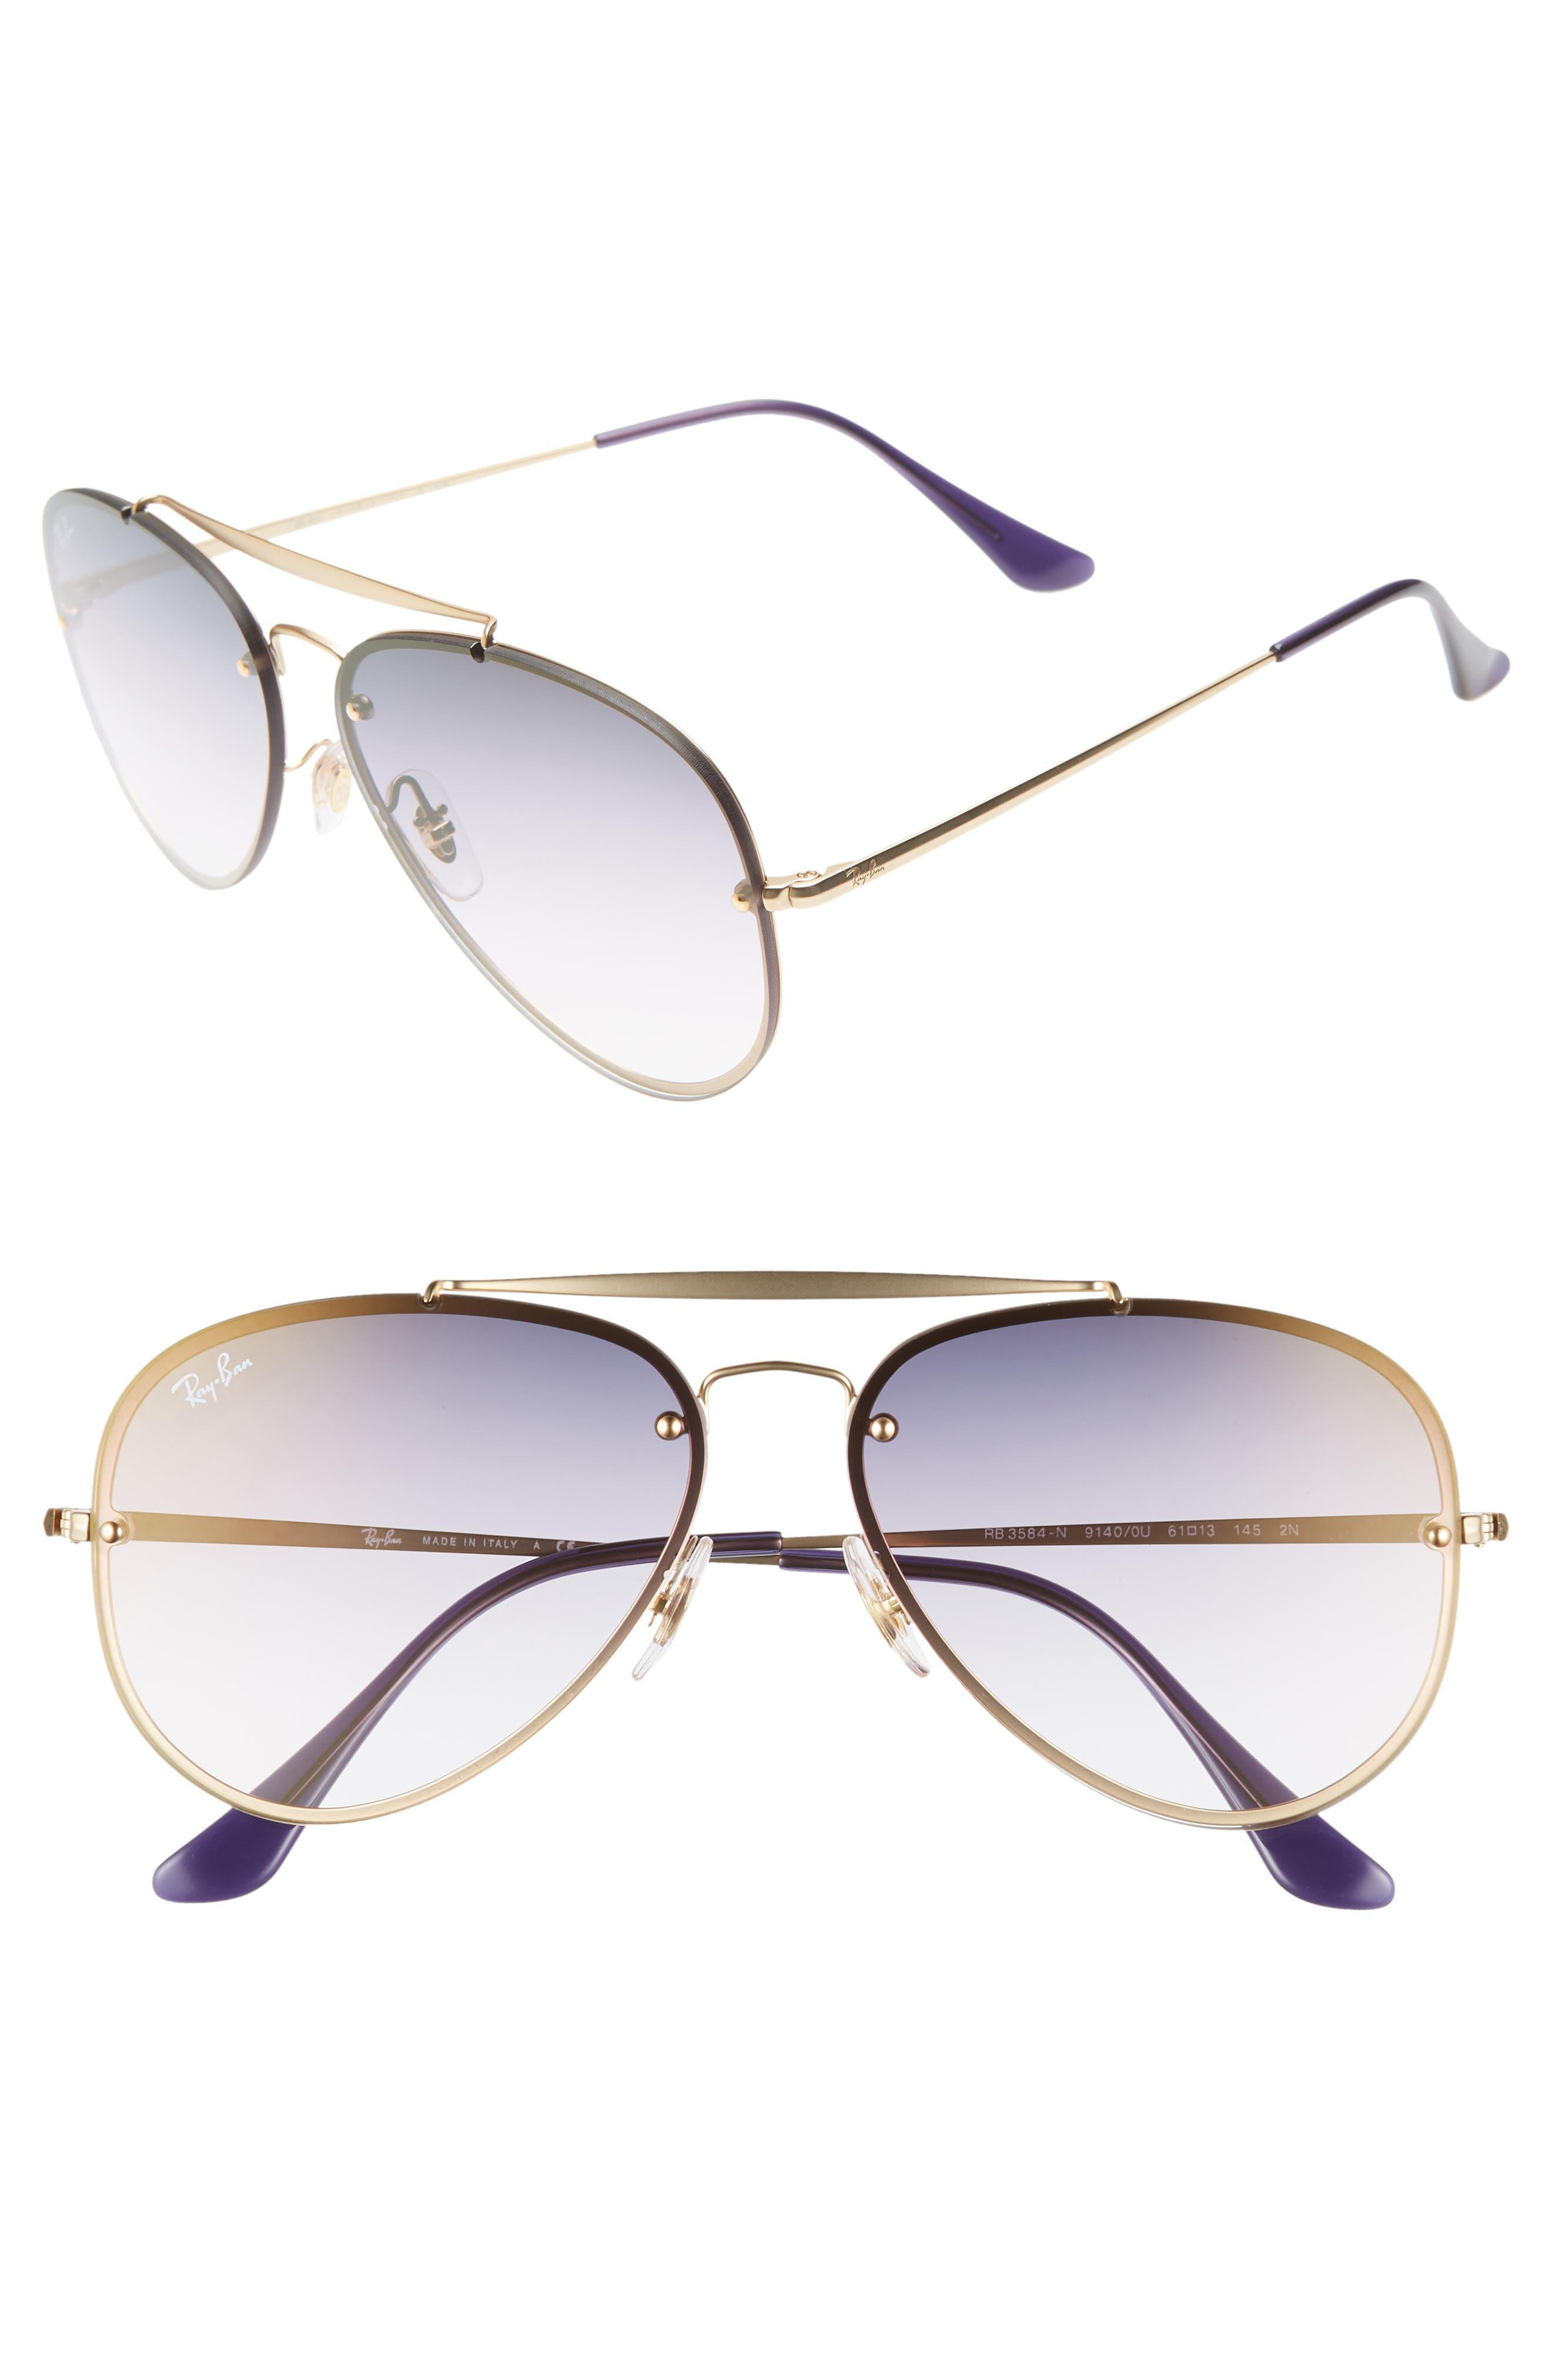 61mm Mirrored Lens Aviator Sunglasses,                         Main,                         color, GOLD/ BLUE VIOLET GRADIENT